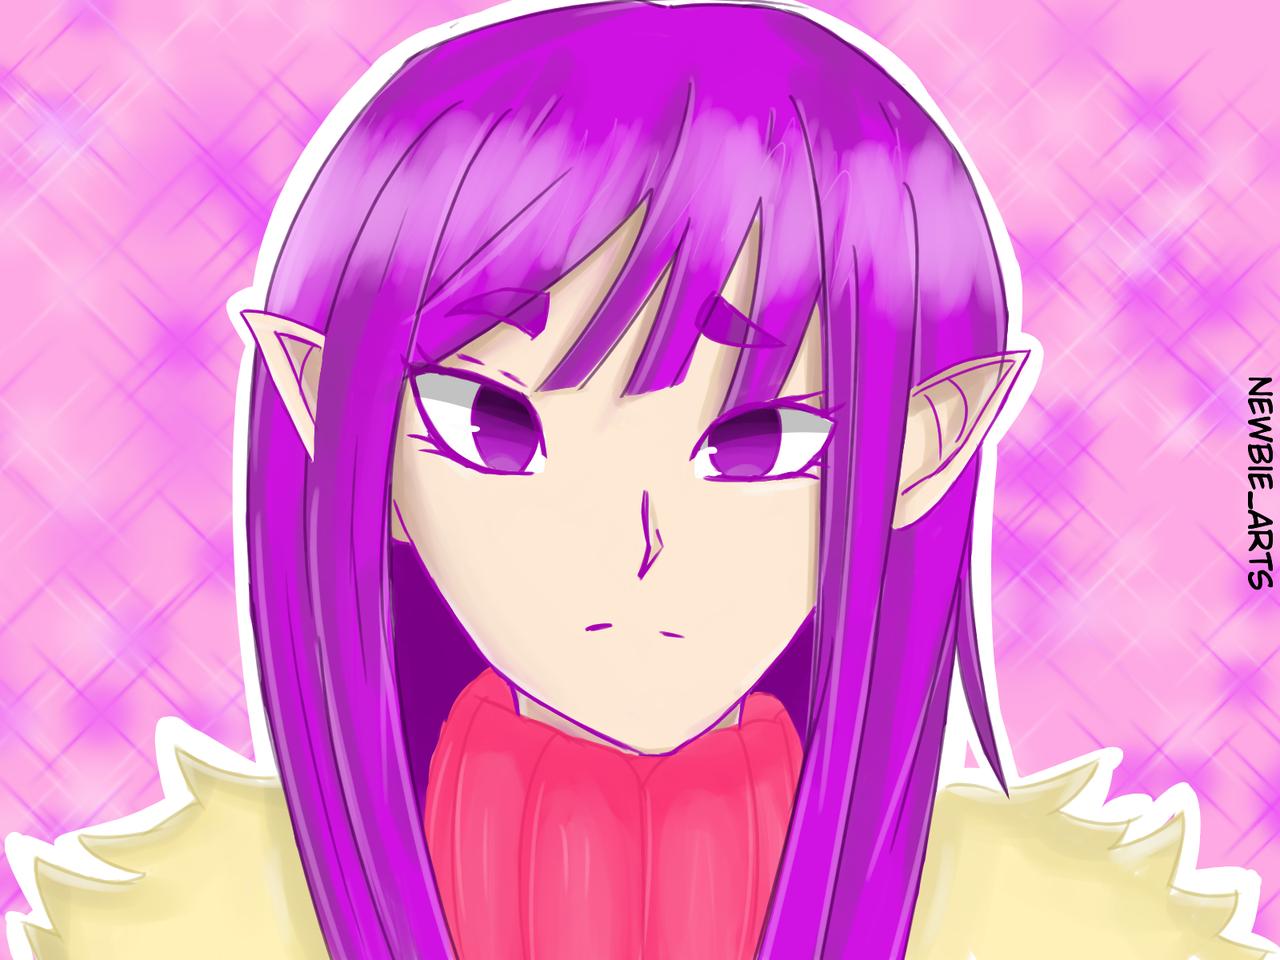 Elf Illust of Newbie anime girl elf illustration